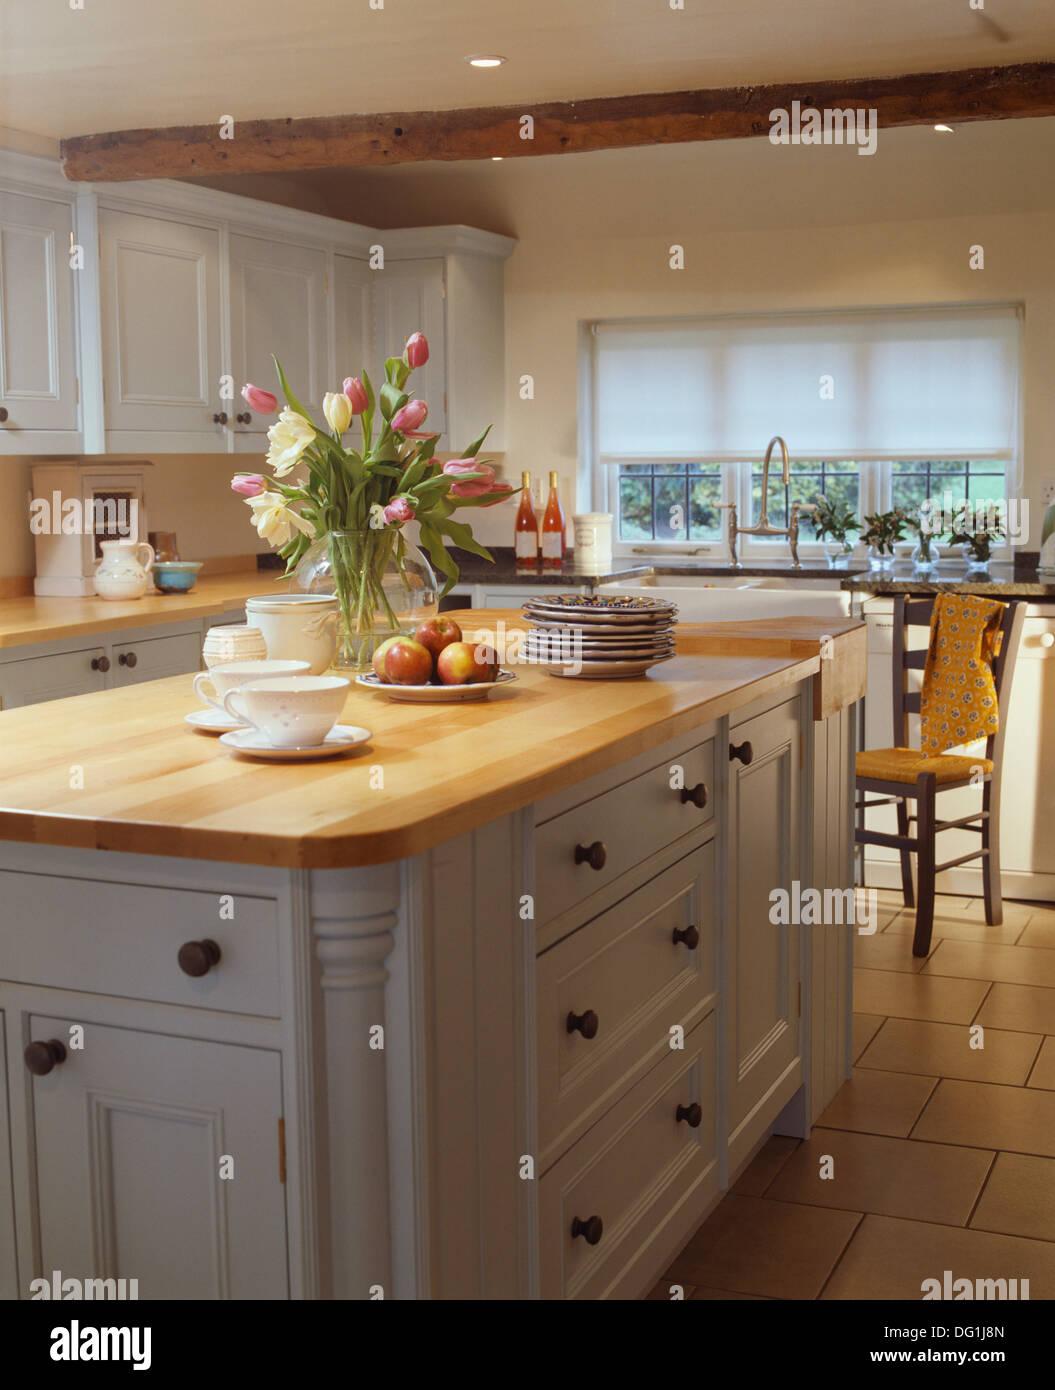 White Kitchen Units Wood Worktop white kitchen units wood worktop vase of tulips on island unit